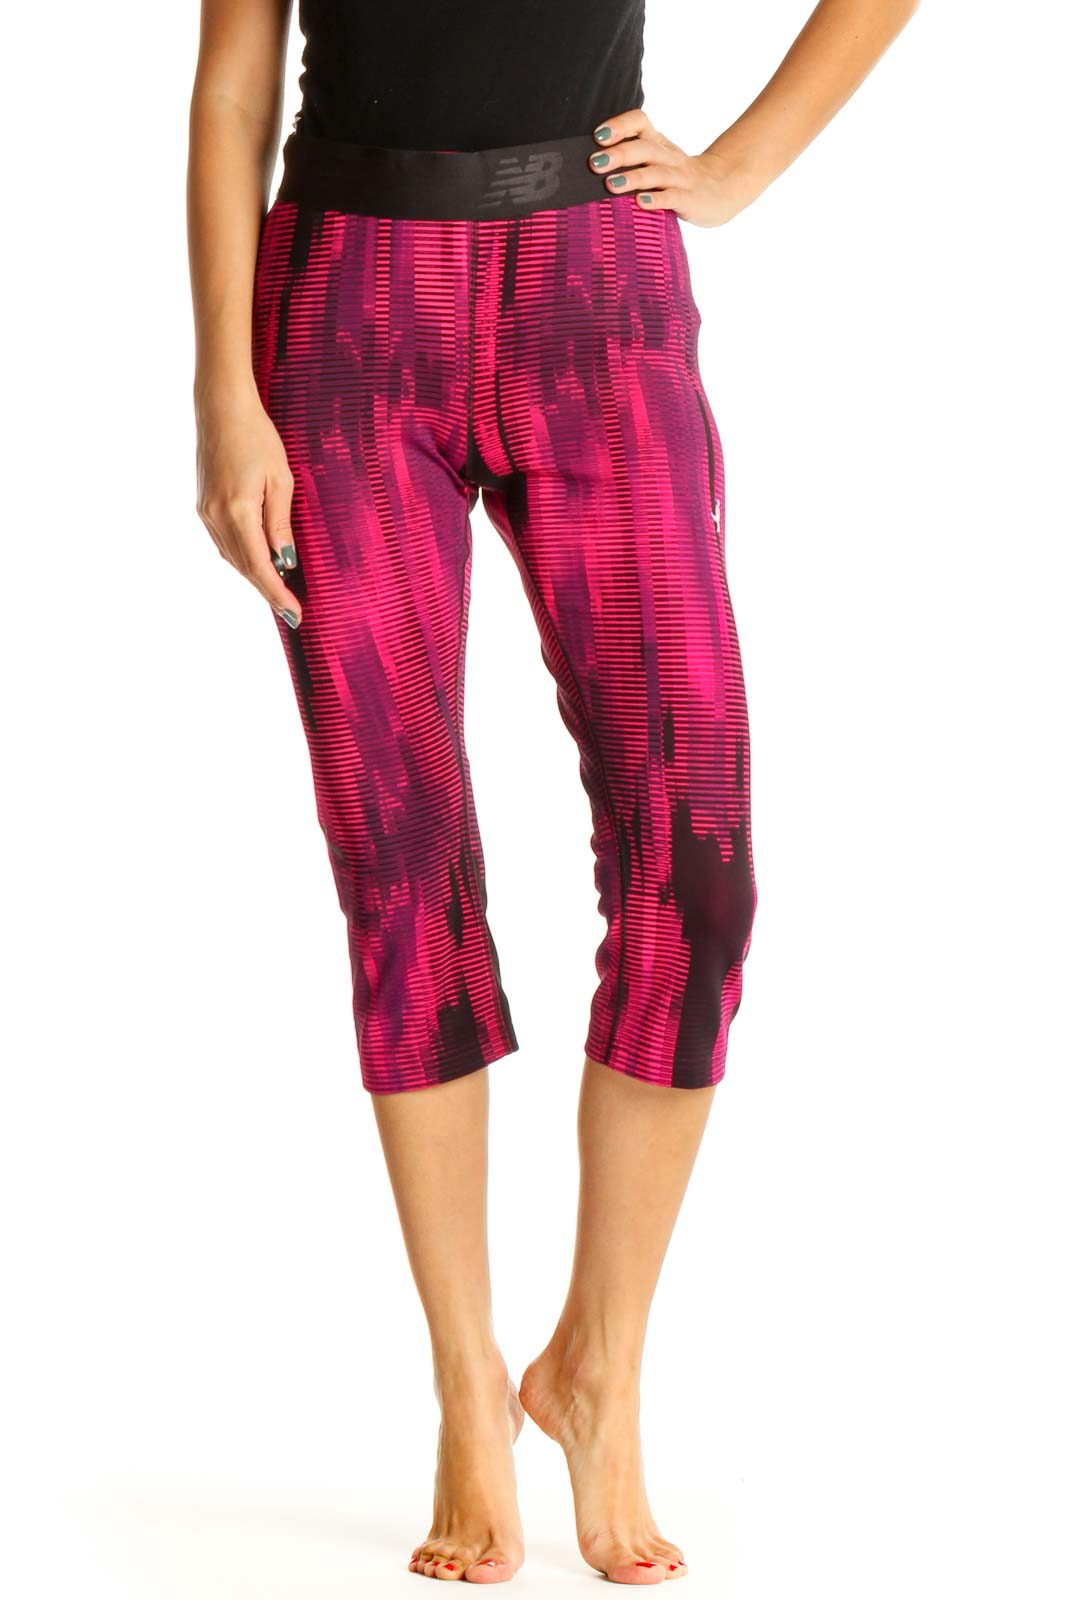 Pink Activewear Leggings Front